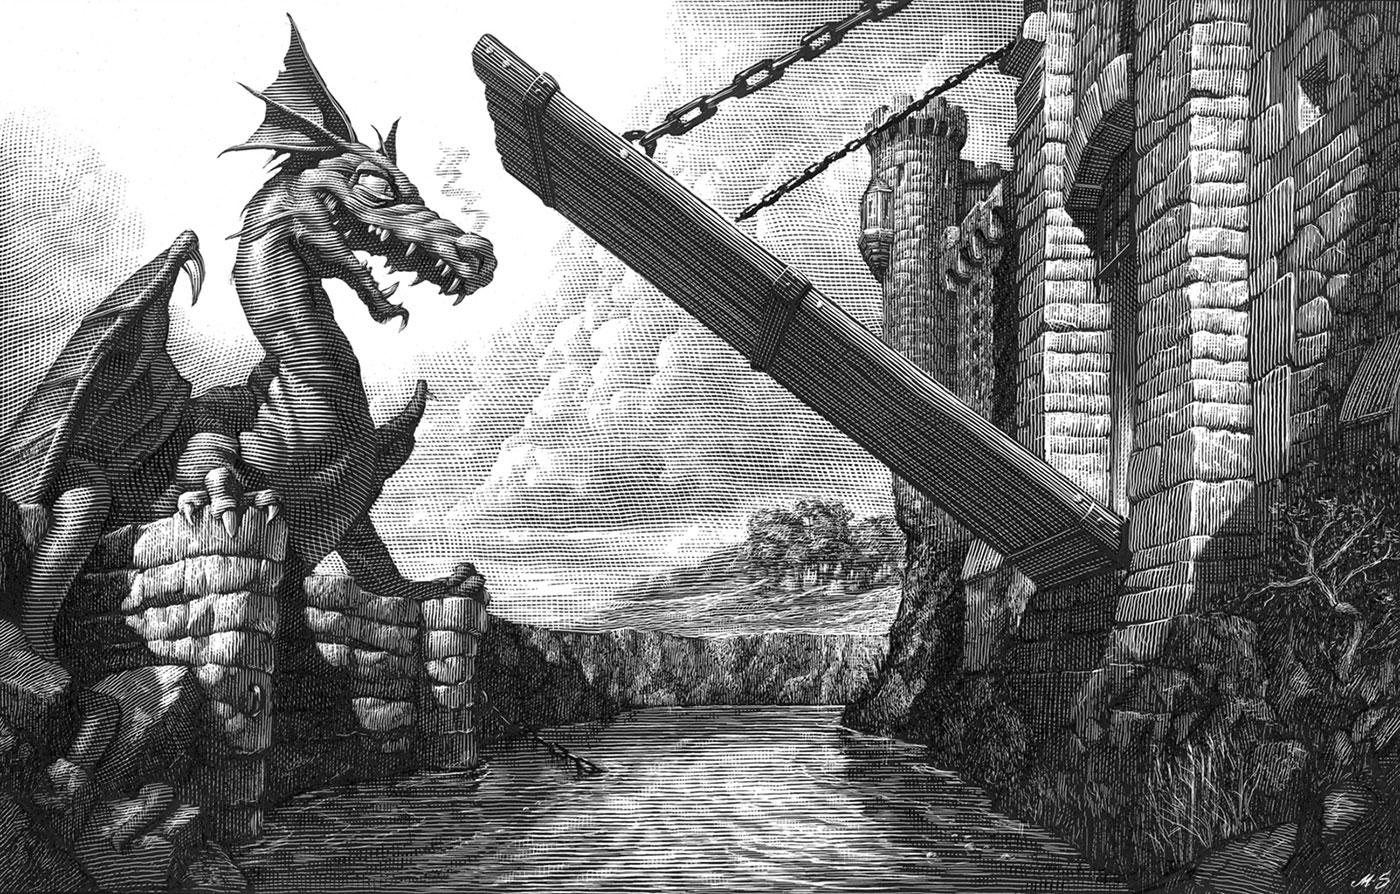 Richard Solomon - Mark-Summers-385-Dragon-001